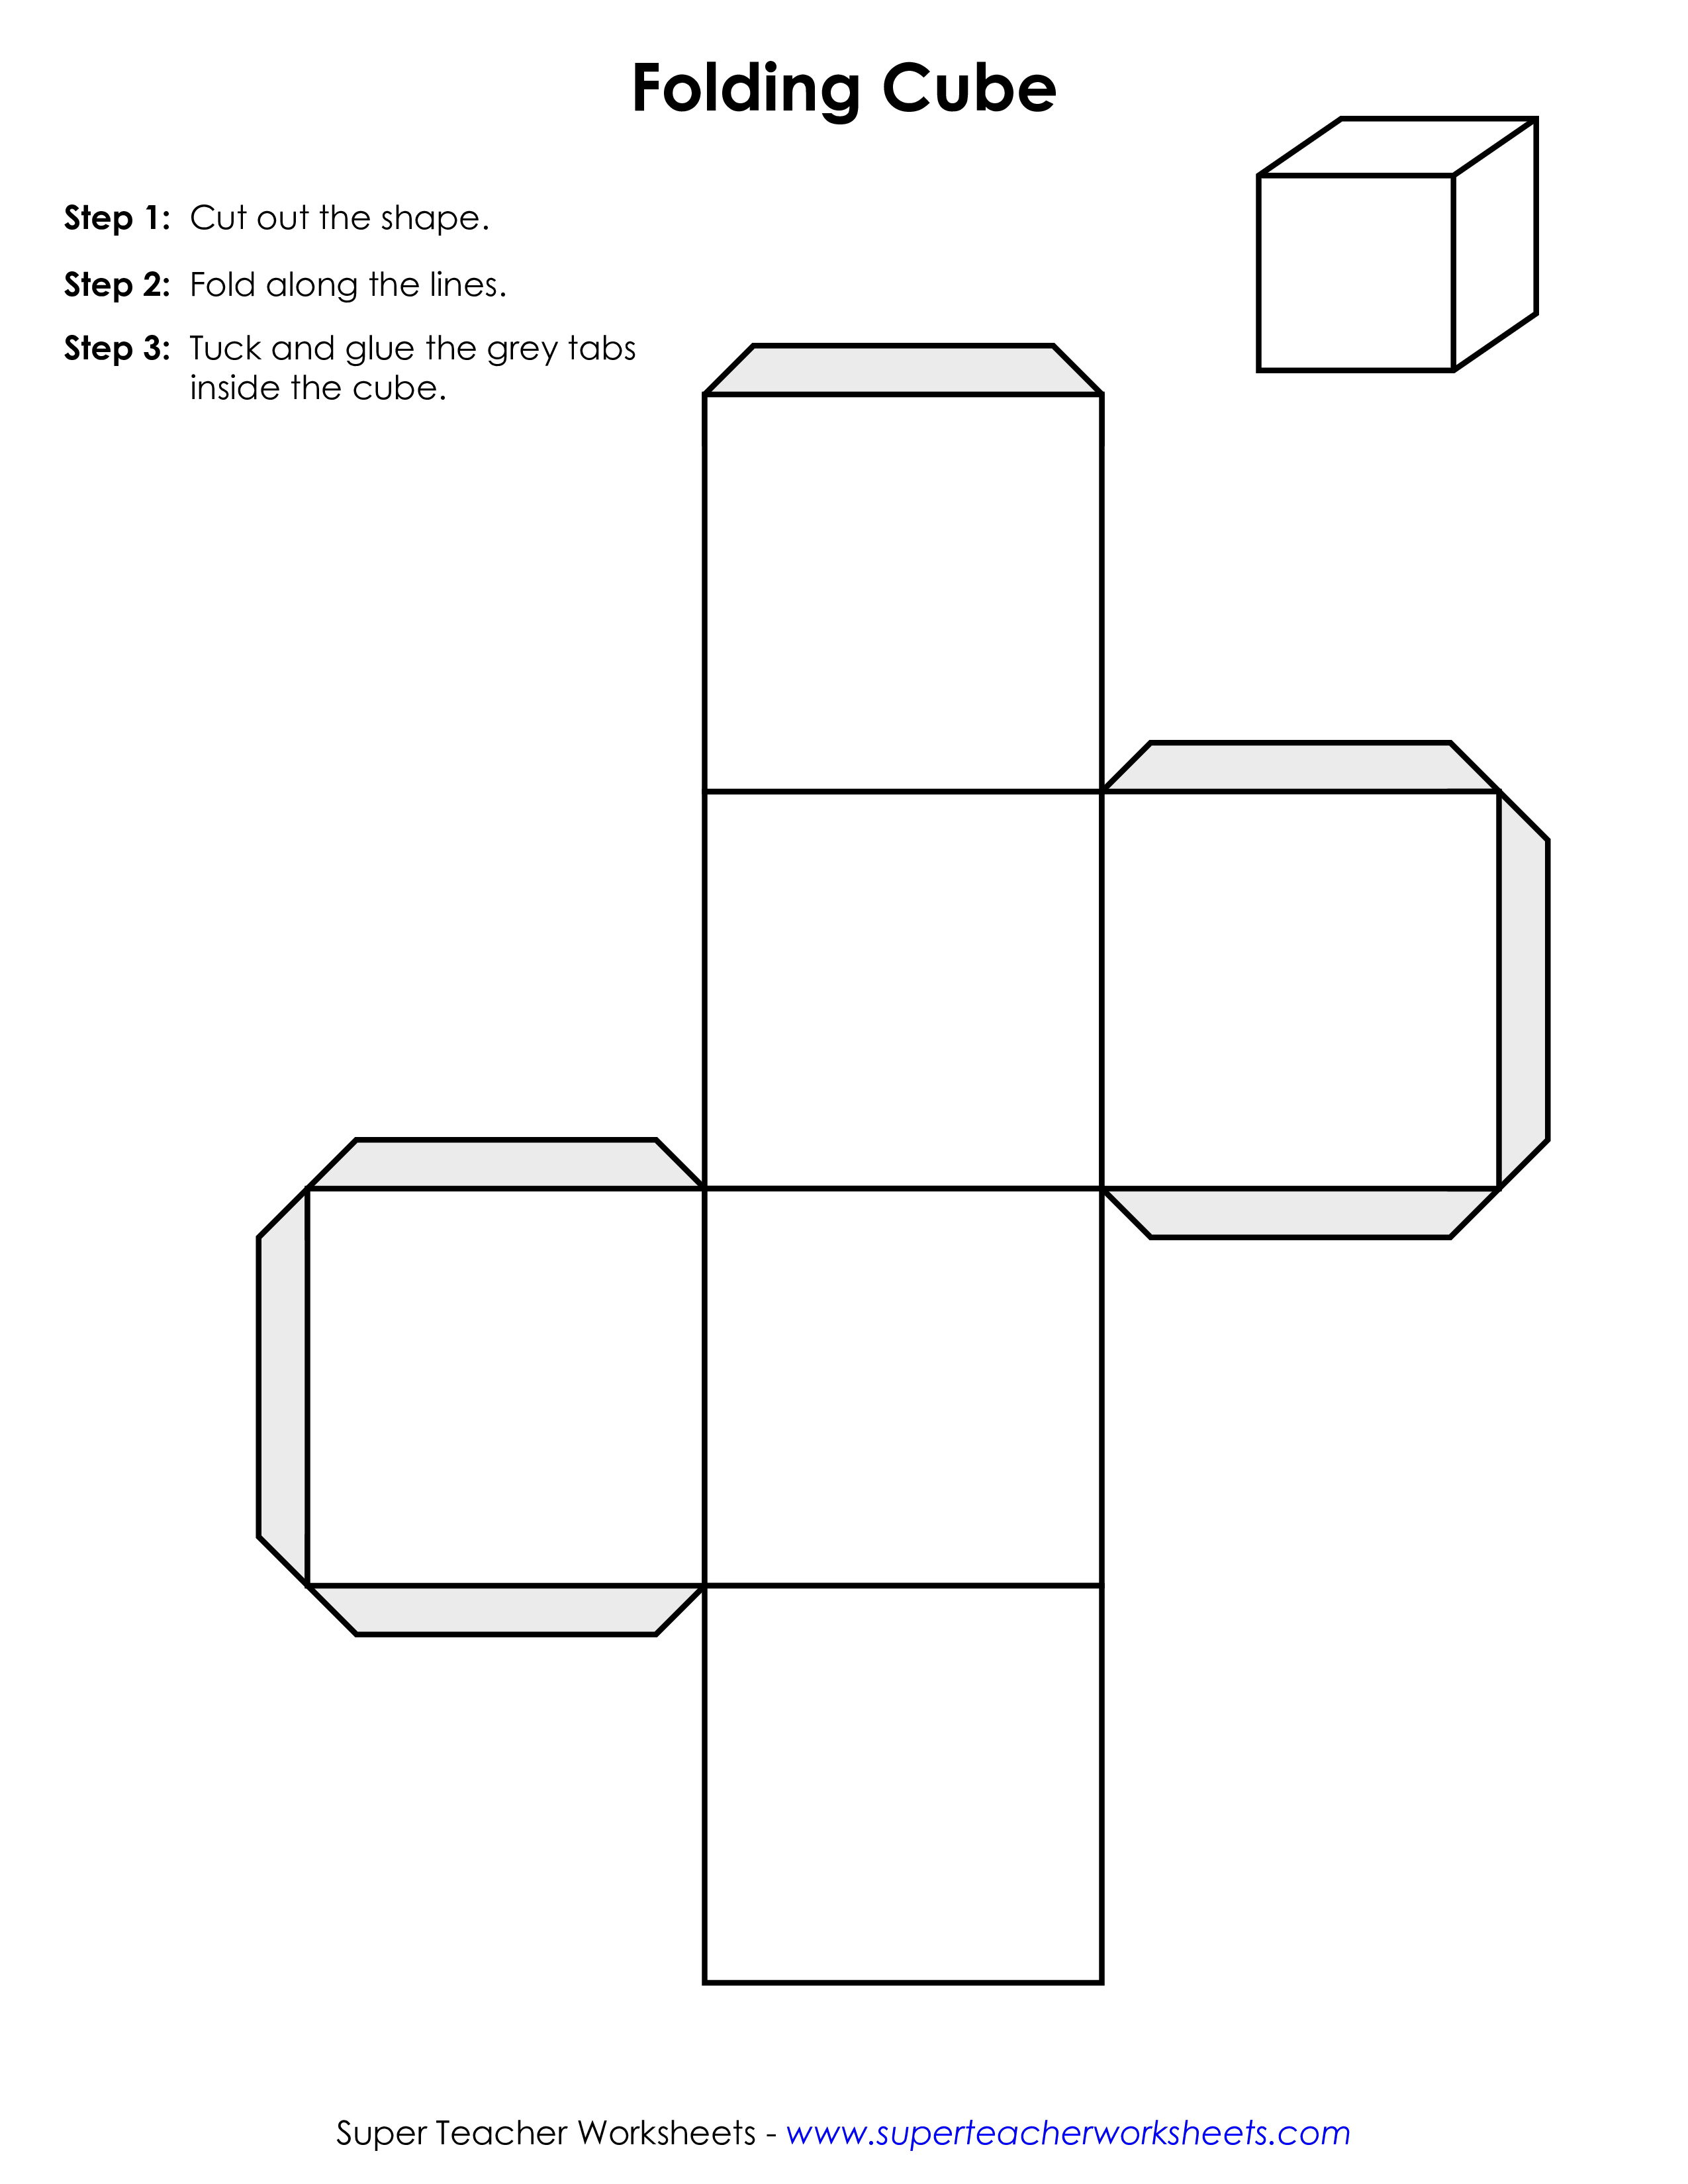 Folded Cube